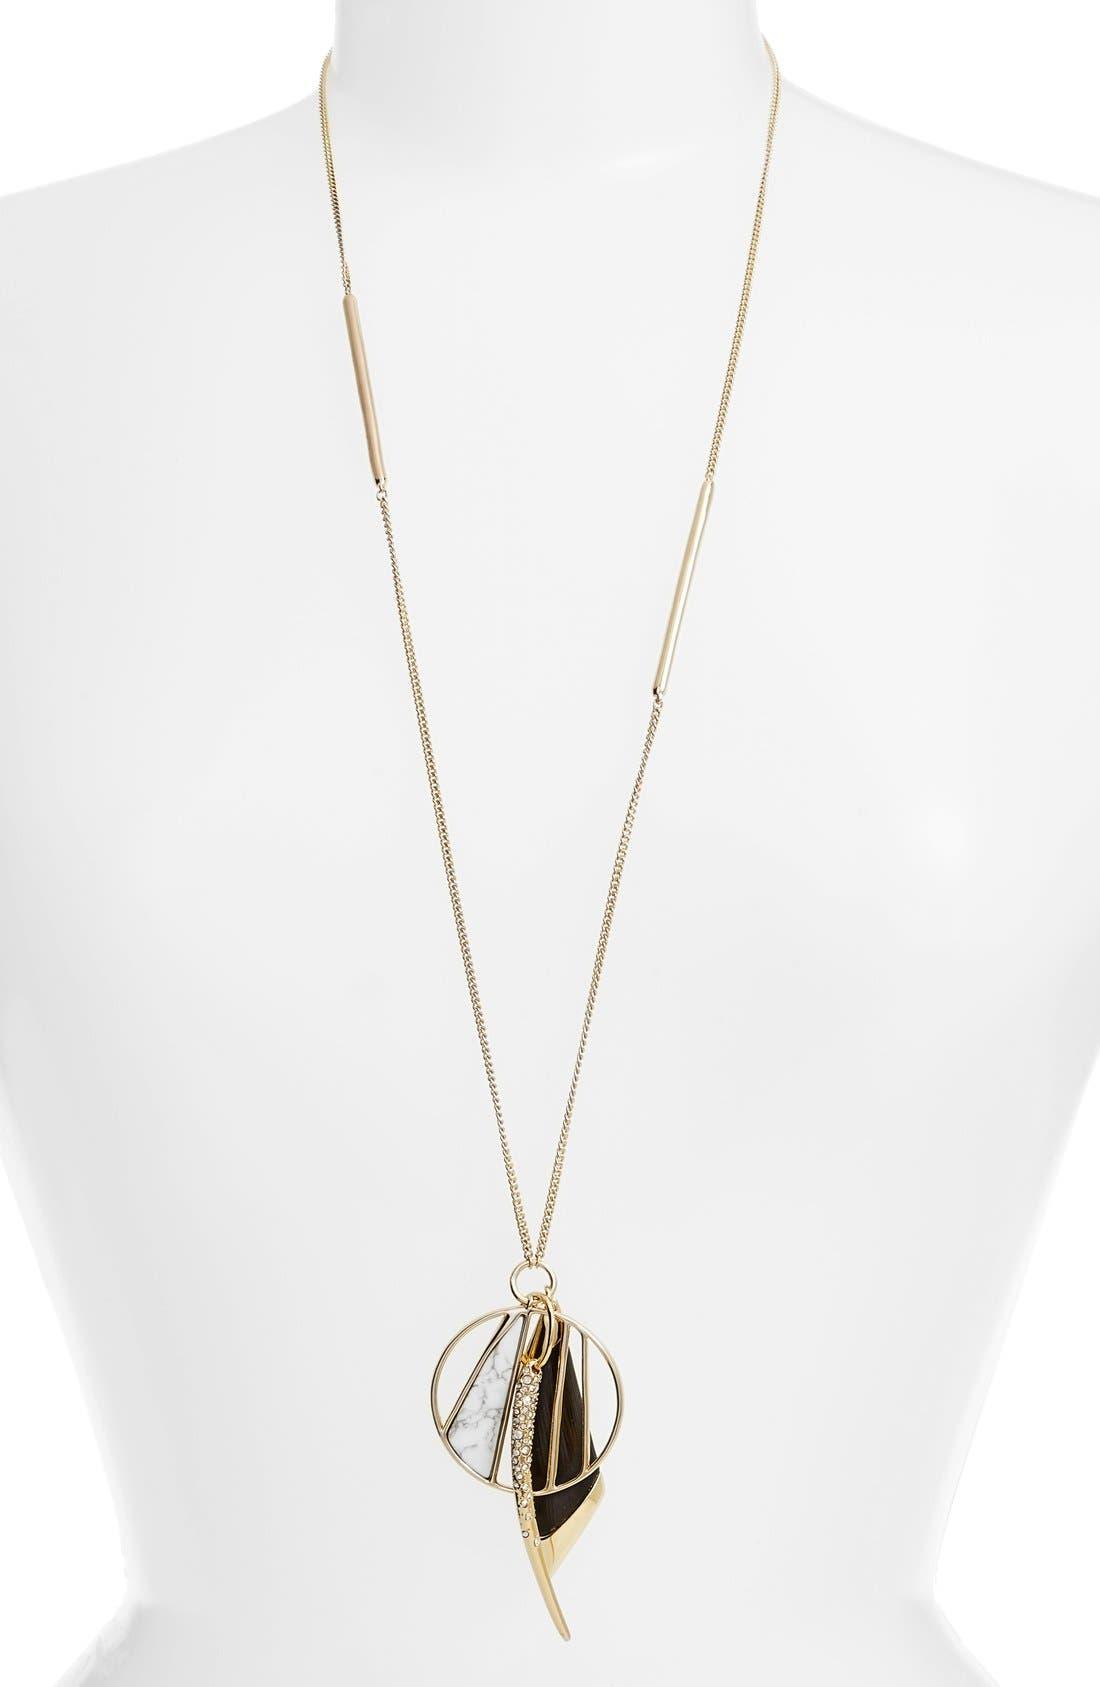 ALEXIS BITTAR, 'Lucite<sup>®</sup> Metal' Crystal Charm Pendant Necklace, Main thumbnail 1, color, 001